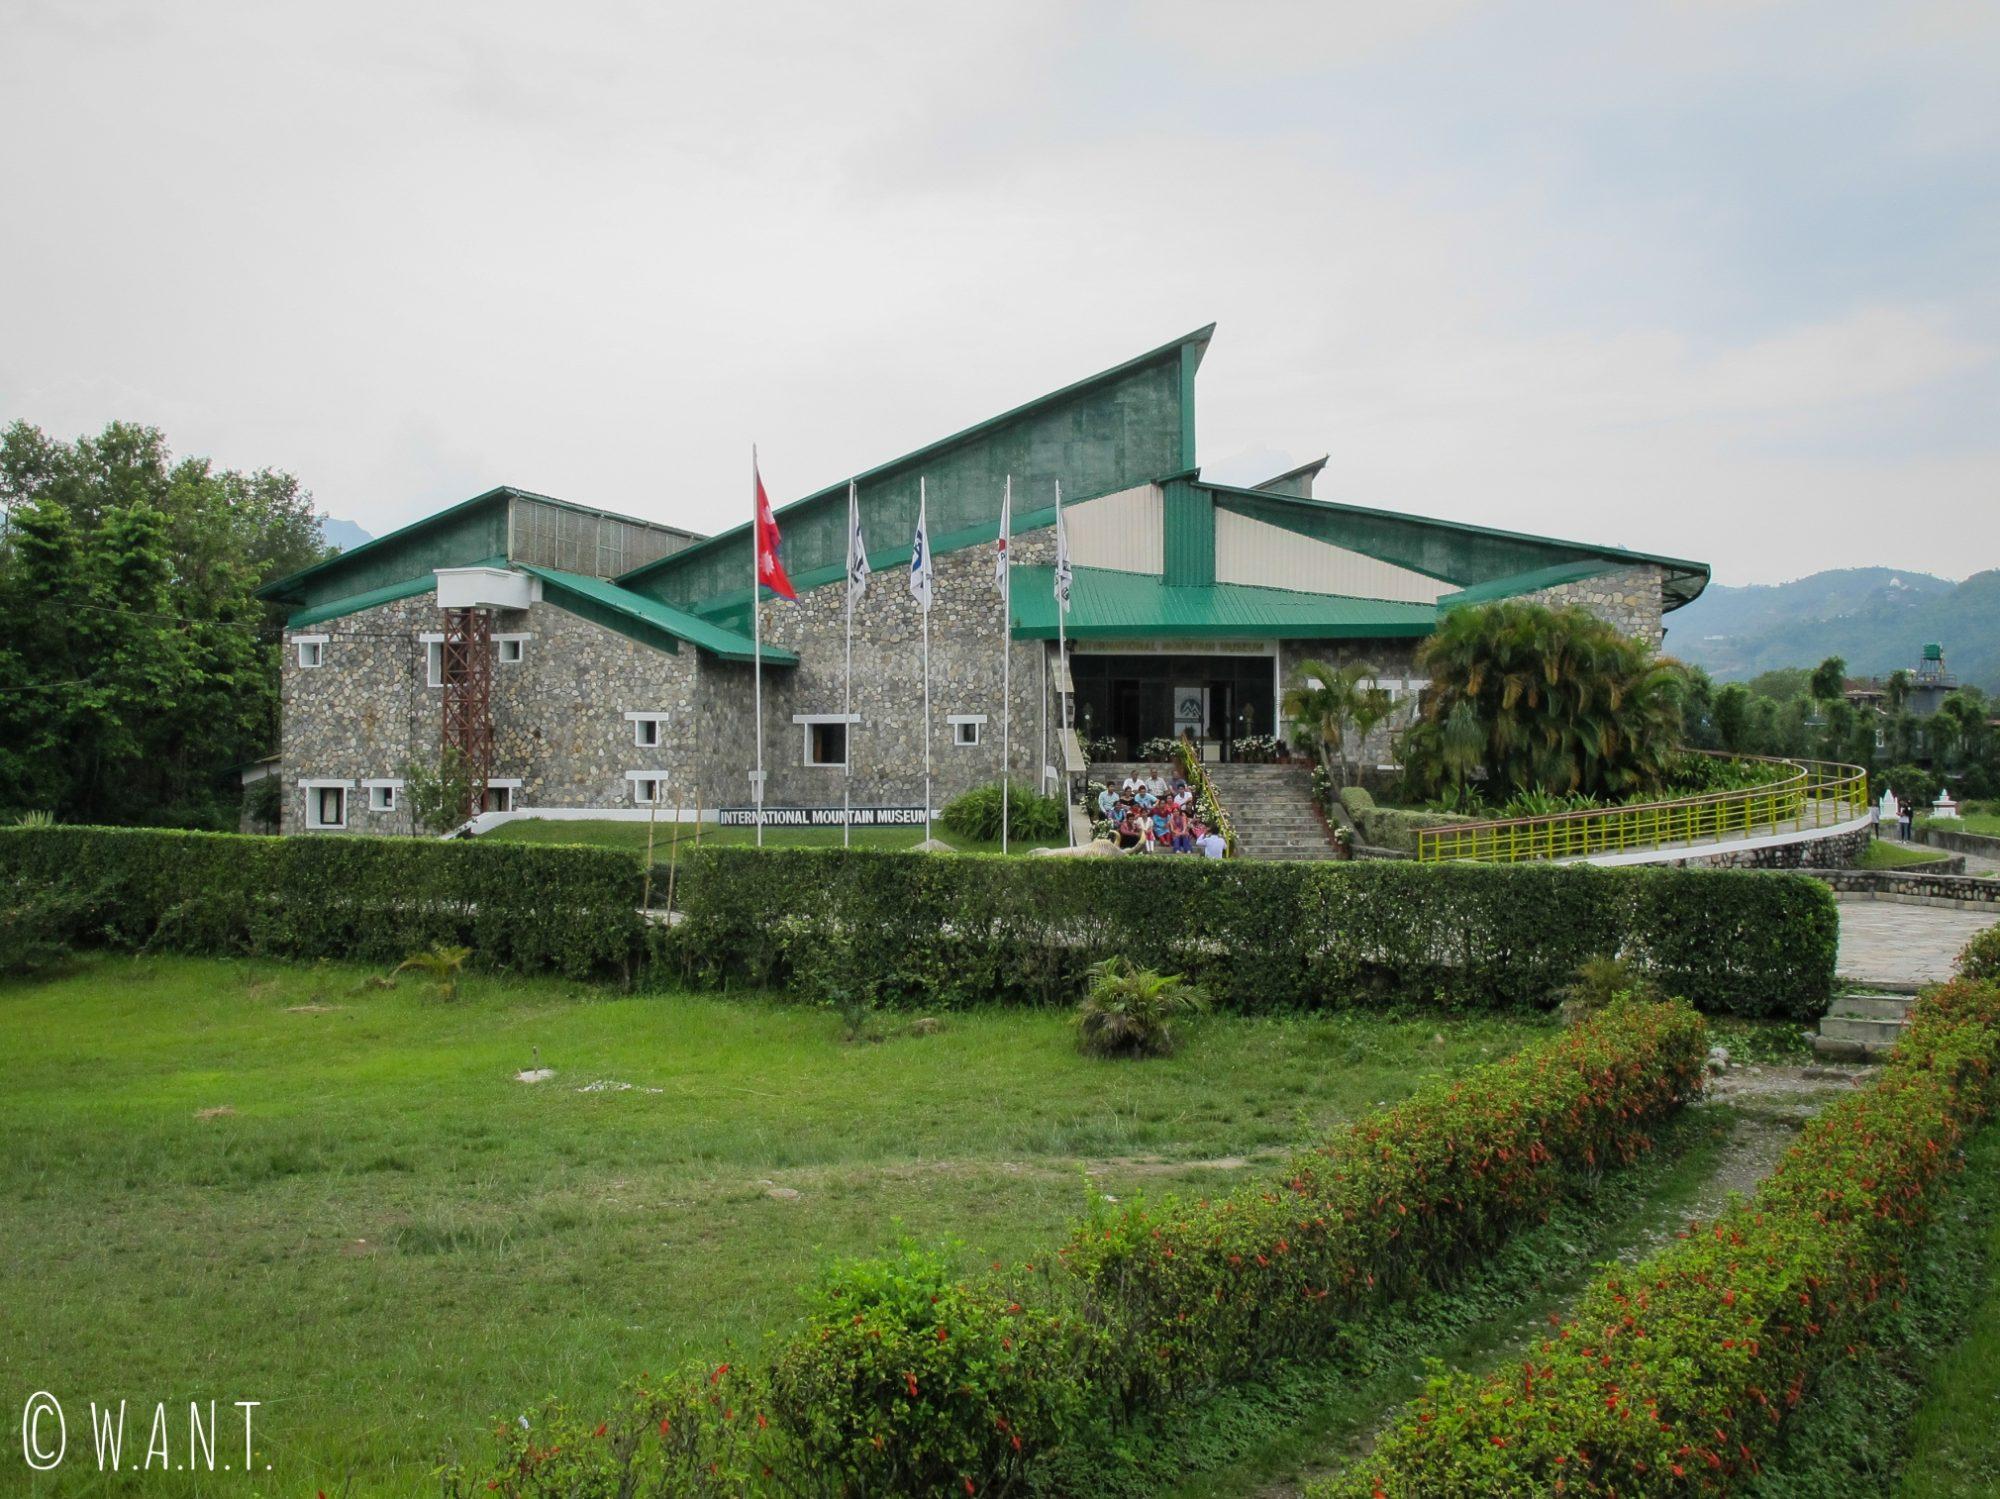 International Mountain Museum de Pokhara vu de l'extérieur